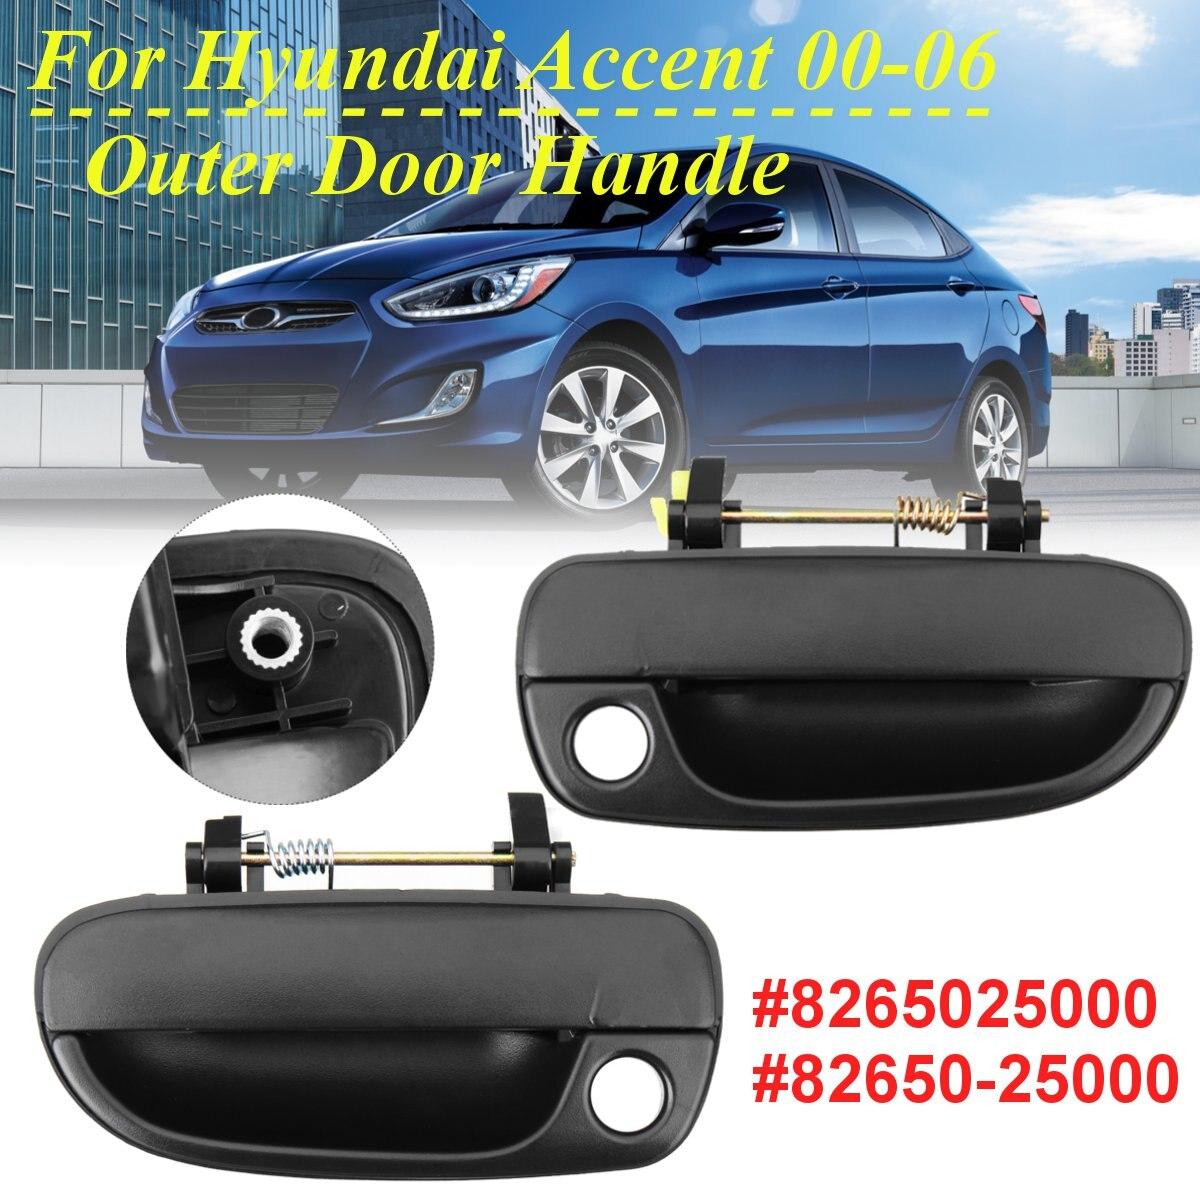 Car Left Front Black Outside Door Handle 82650-1e050 for Hyundai Accent 2006-11